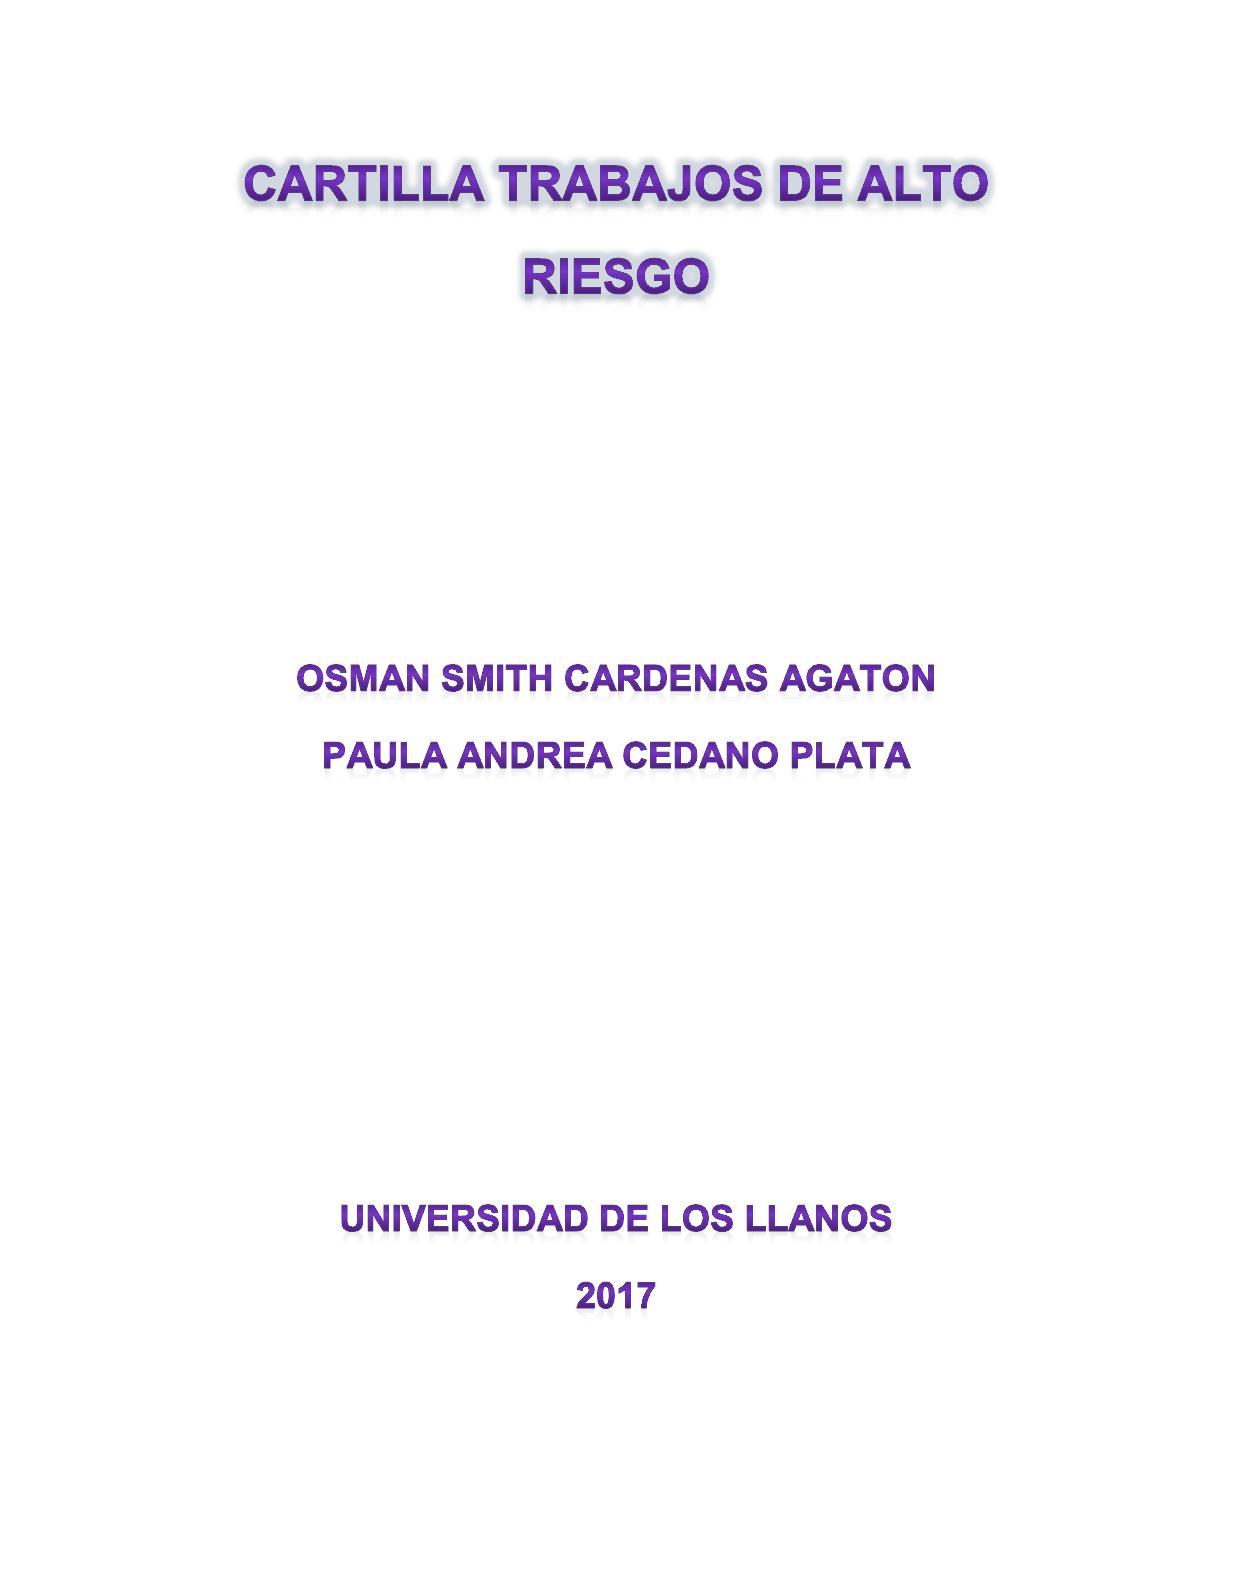 Calaméo - Cartilla Trabajos De Alto Riesgo 2017